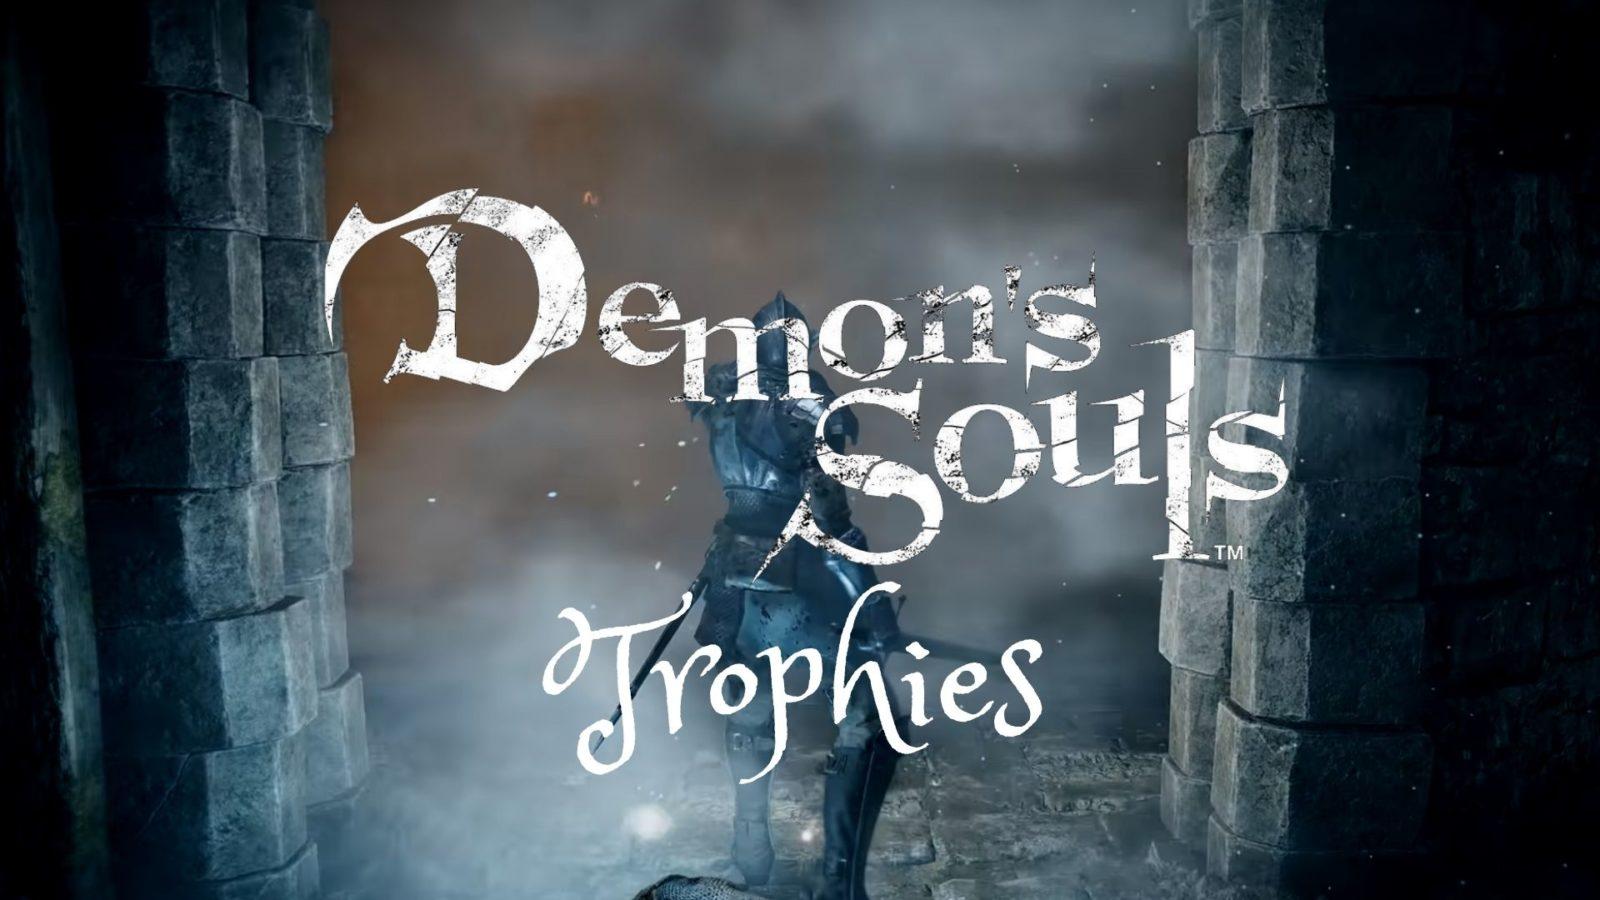 demon's souls trophy list featured image